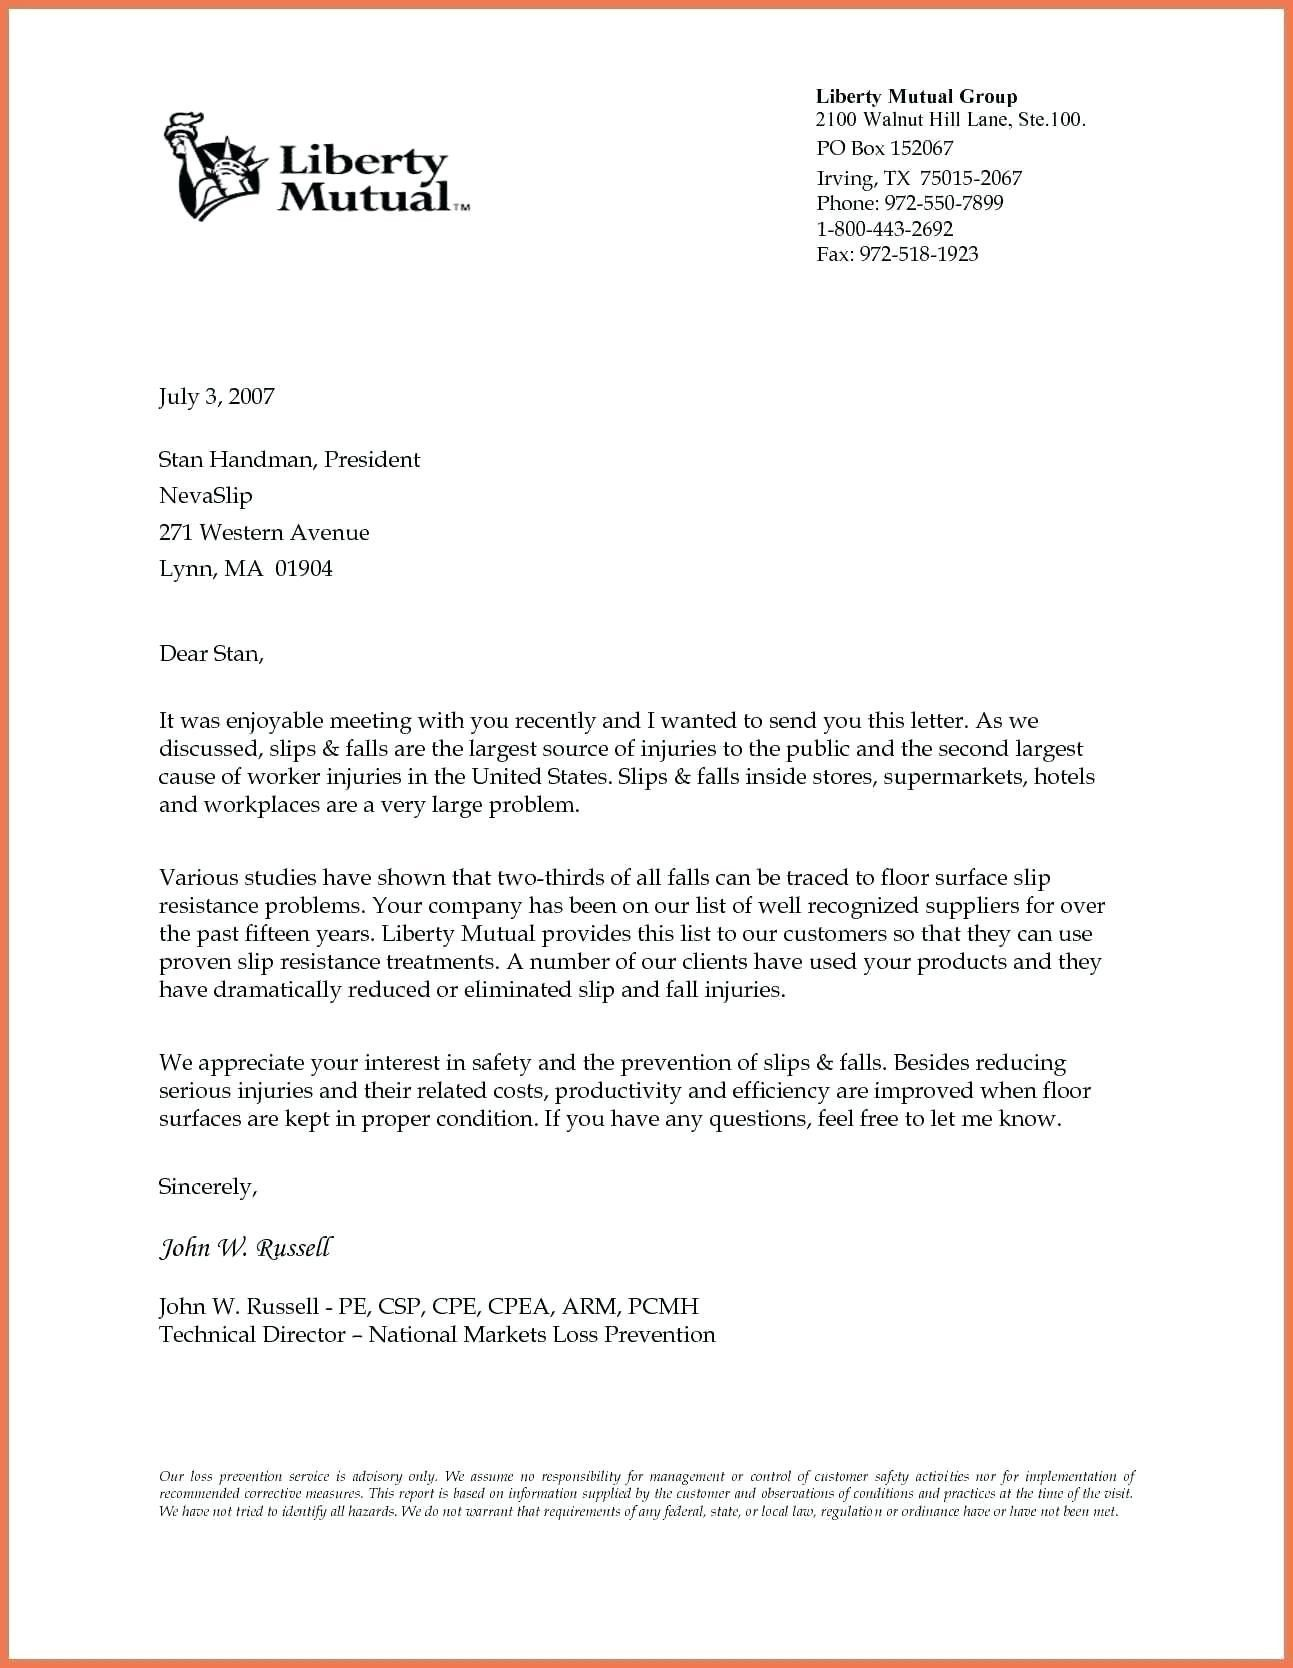 007 Unforgettable Formal Busines Letter Template High Definition  Pdf Australia FormatFull